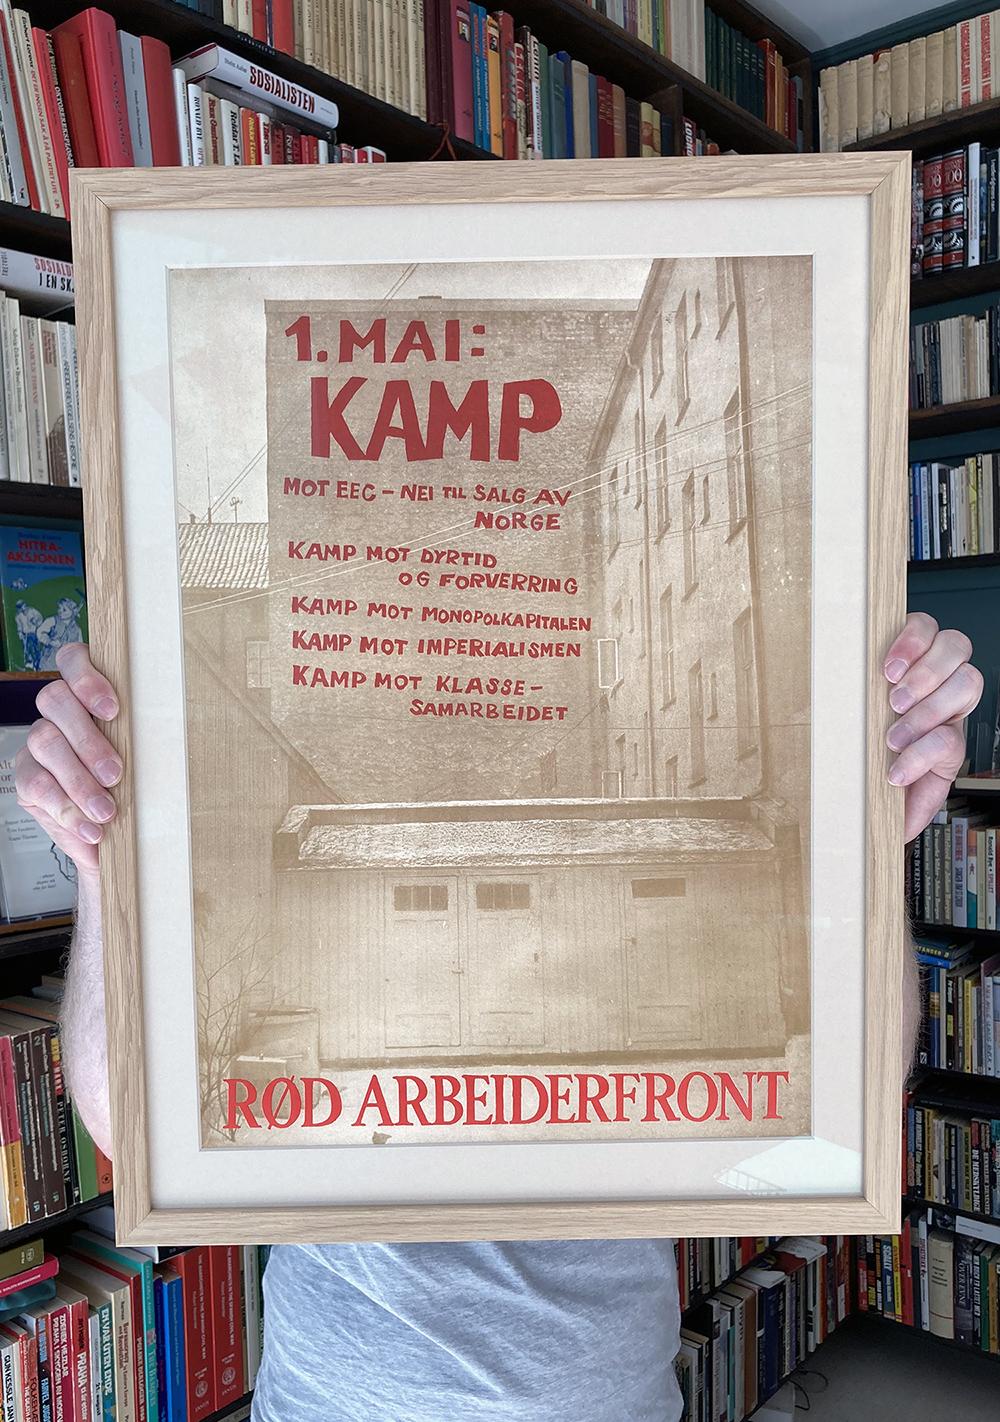 1. mai: Kamp - Rød arbeiderfront (1972)